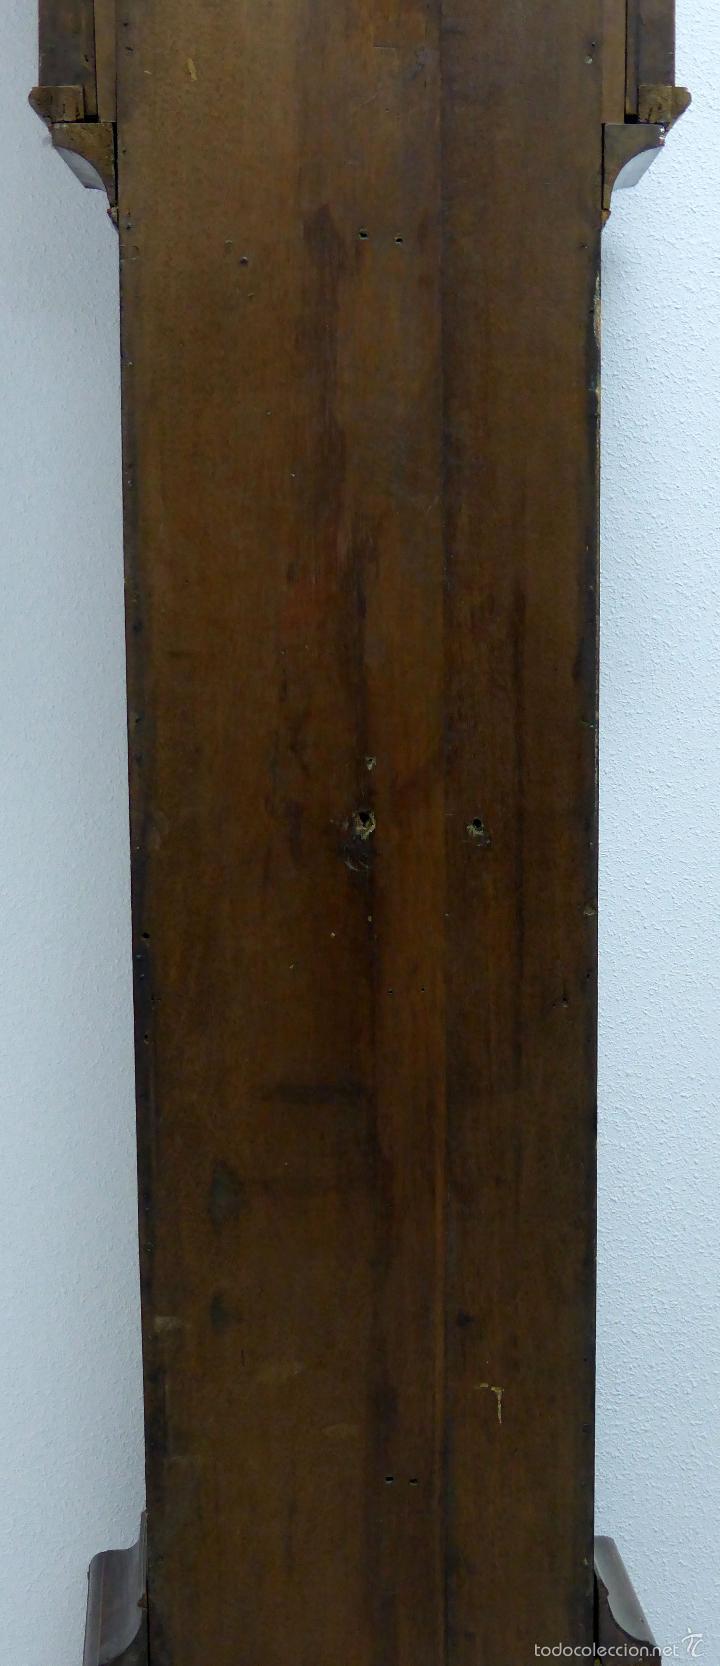 Relojes de pie: Reloj pie inglés laca japanning chinoseries S XVIII Maquinaria William Fidgett London Funciona - Foto 20 - 58294331